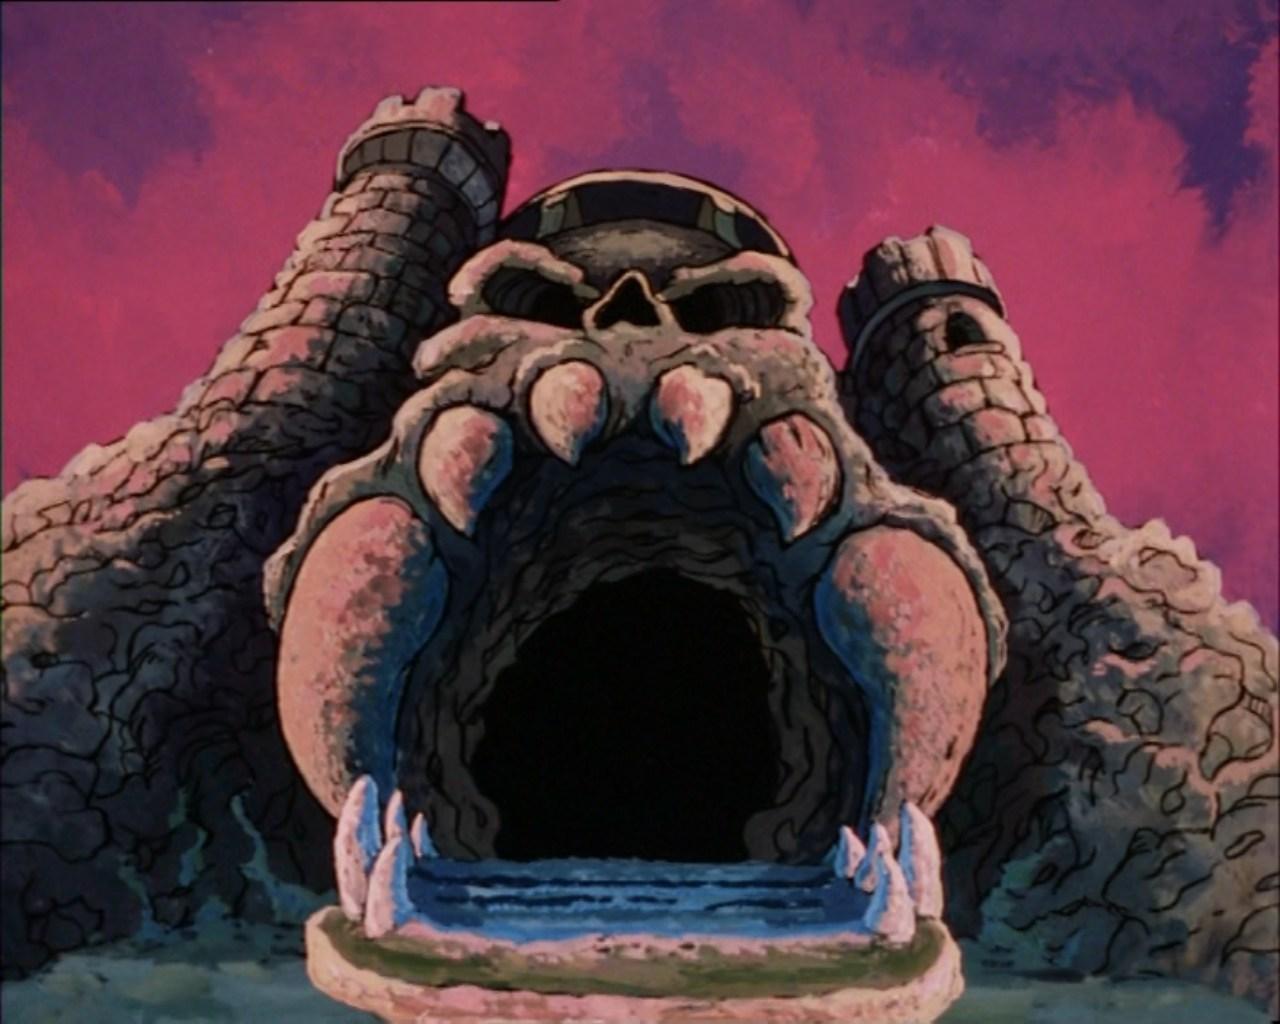 he man greyskull - Cartoon Caravan: He-Man and the Masters of the Universe (Filmation, 1983)